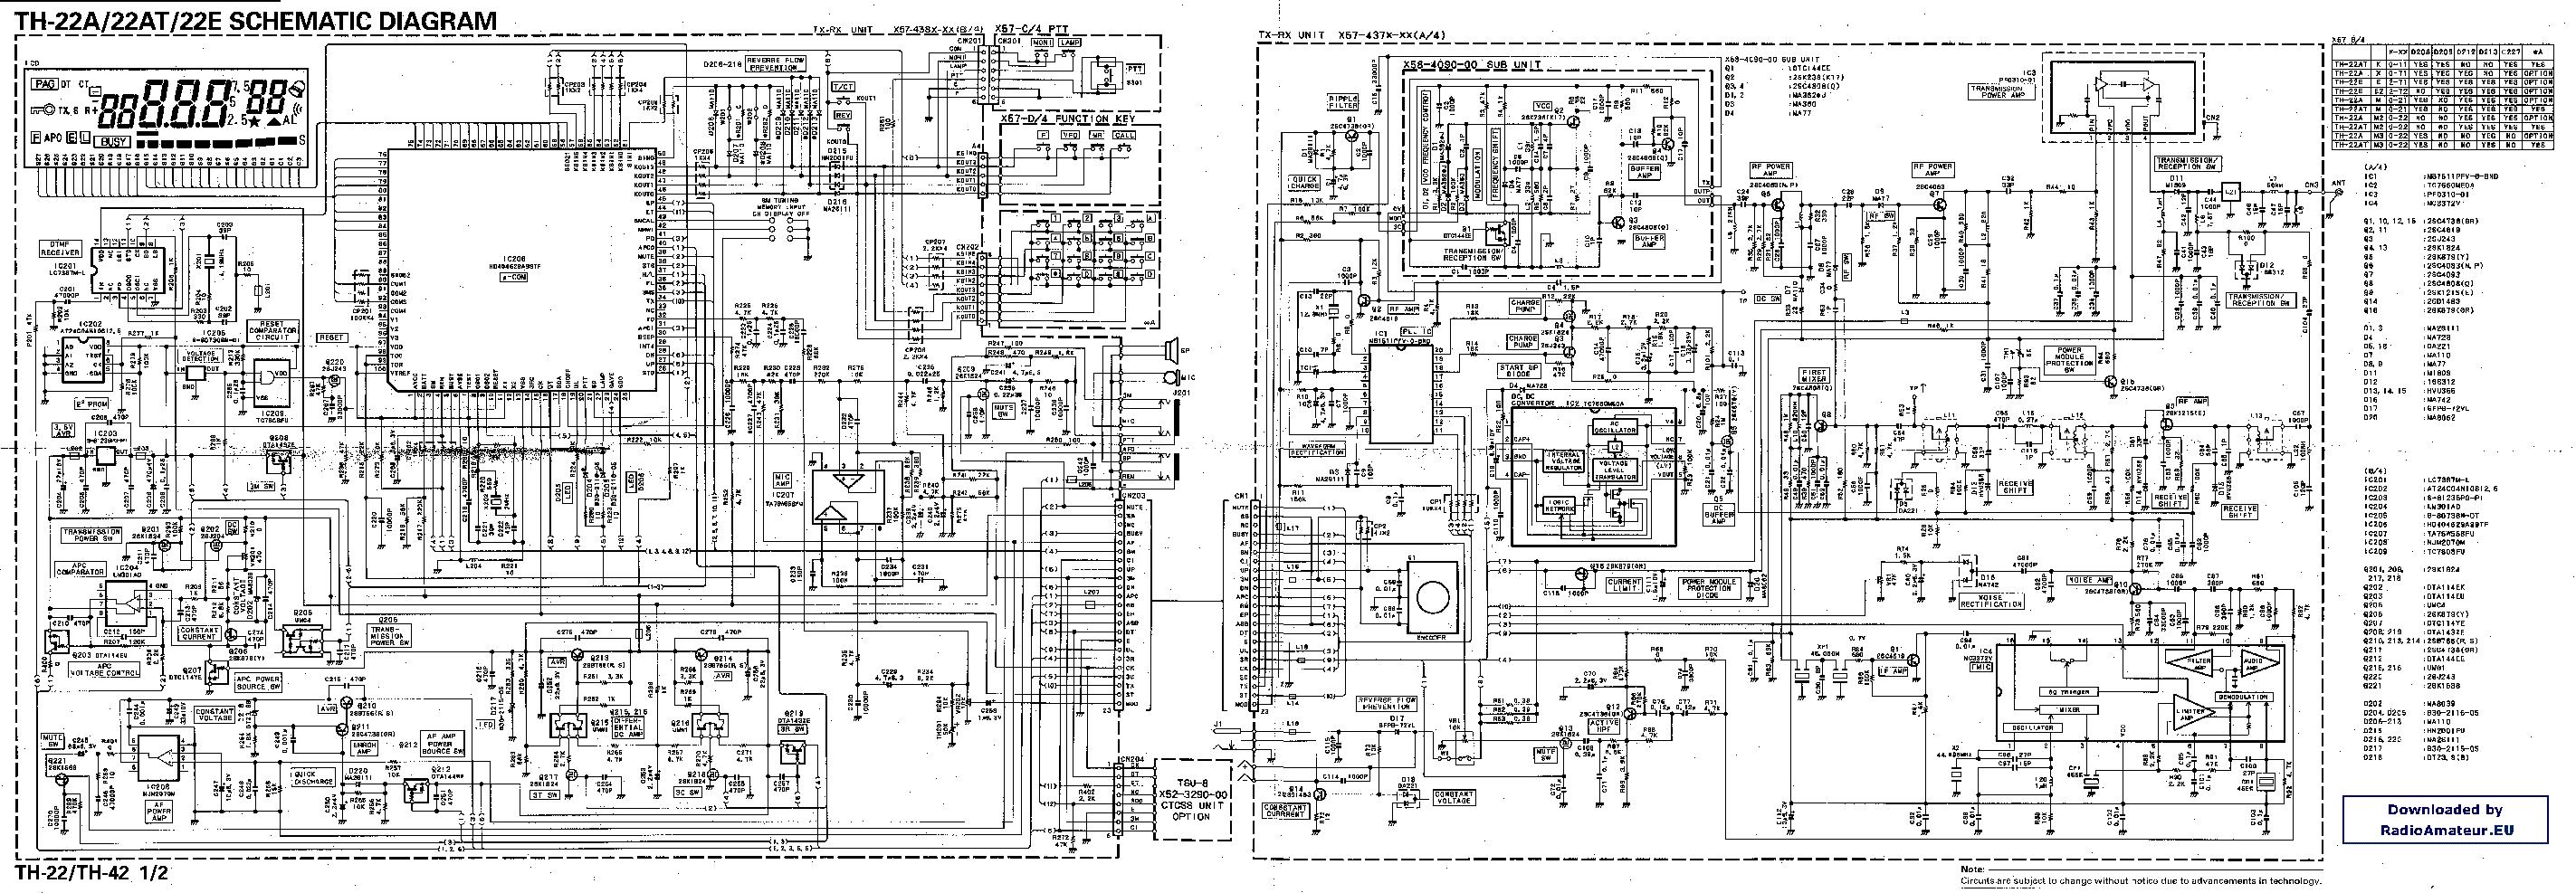 free ebook from electronics repair pdf